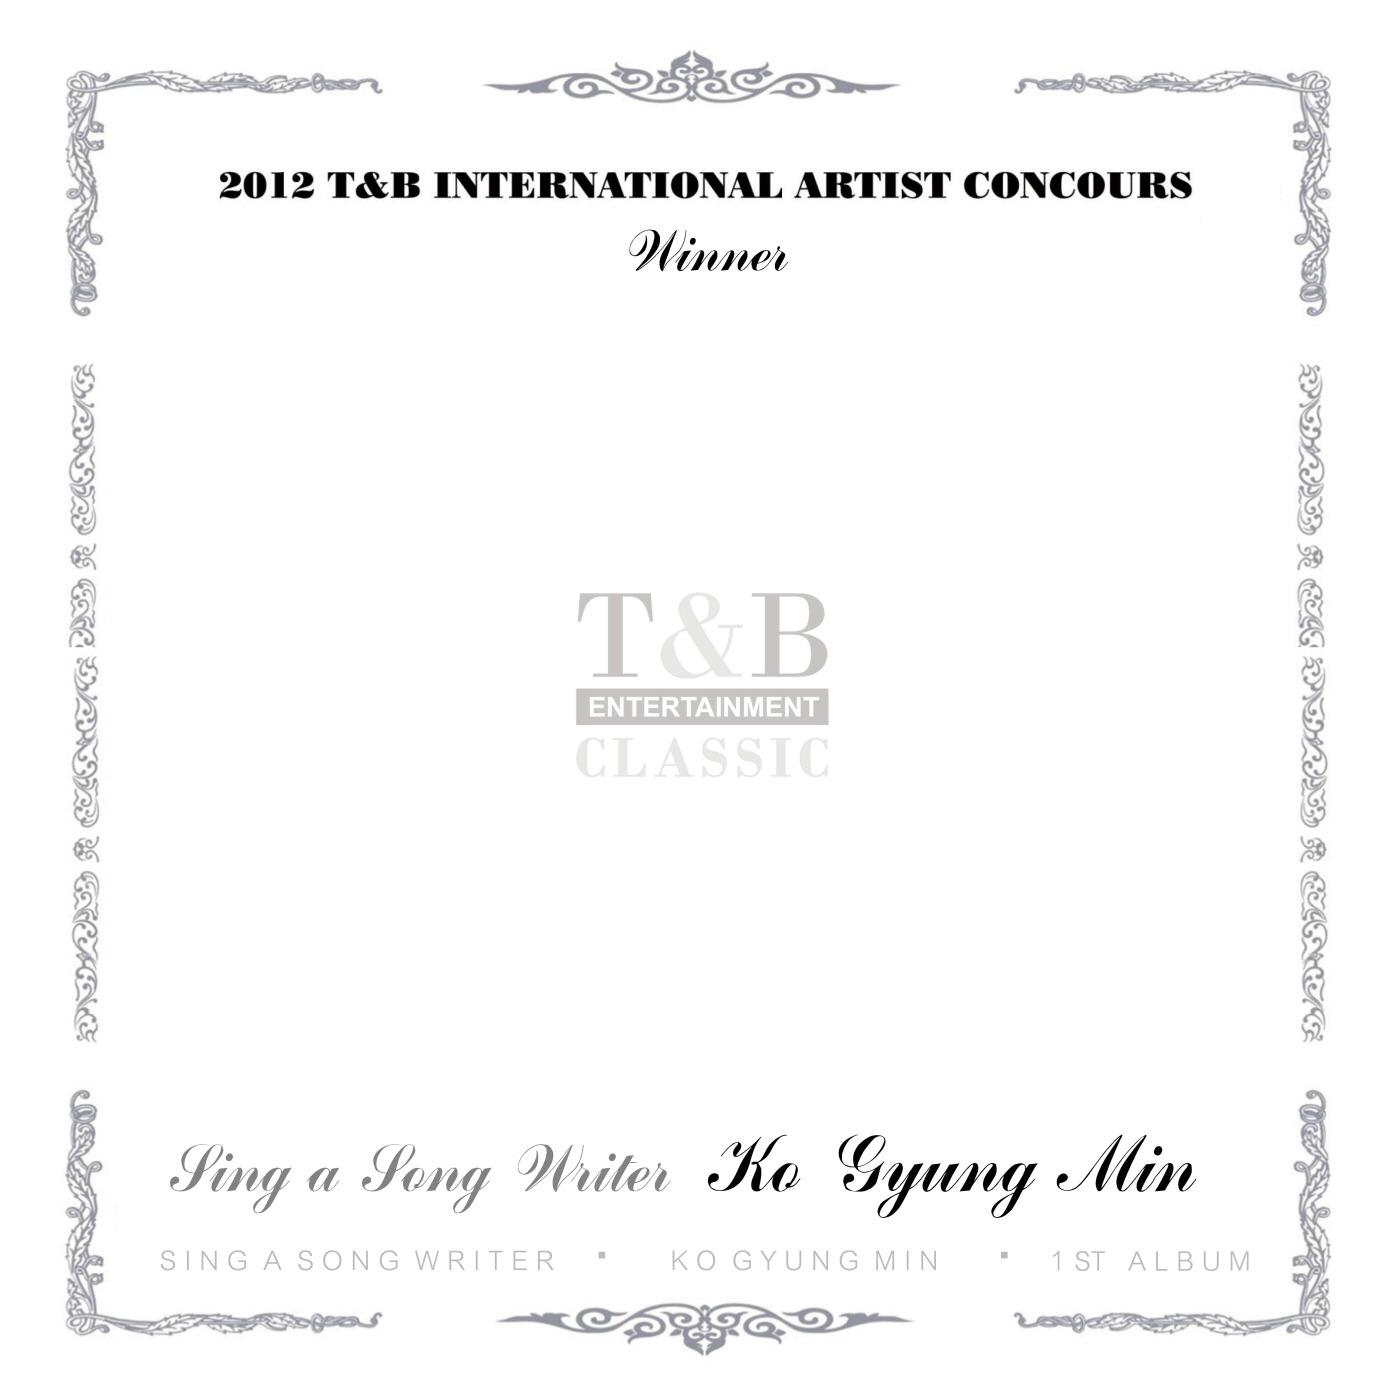 '1st T&B'_싱어송라이터 고경민.jpg